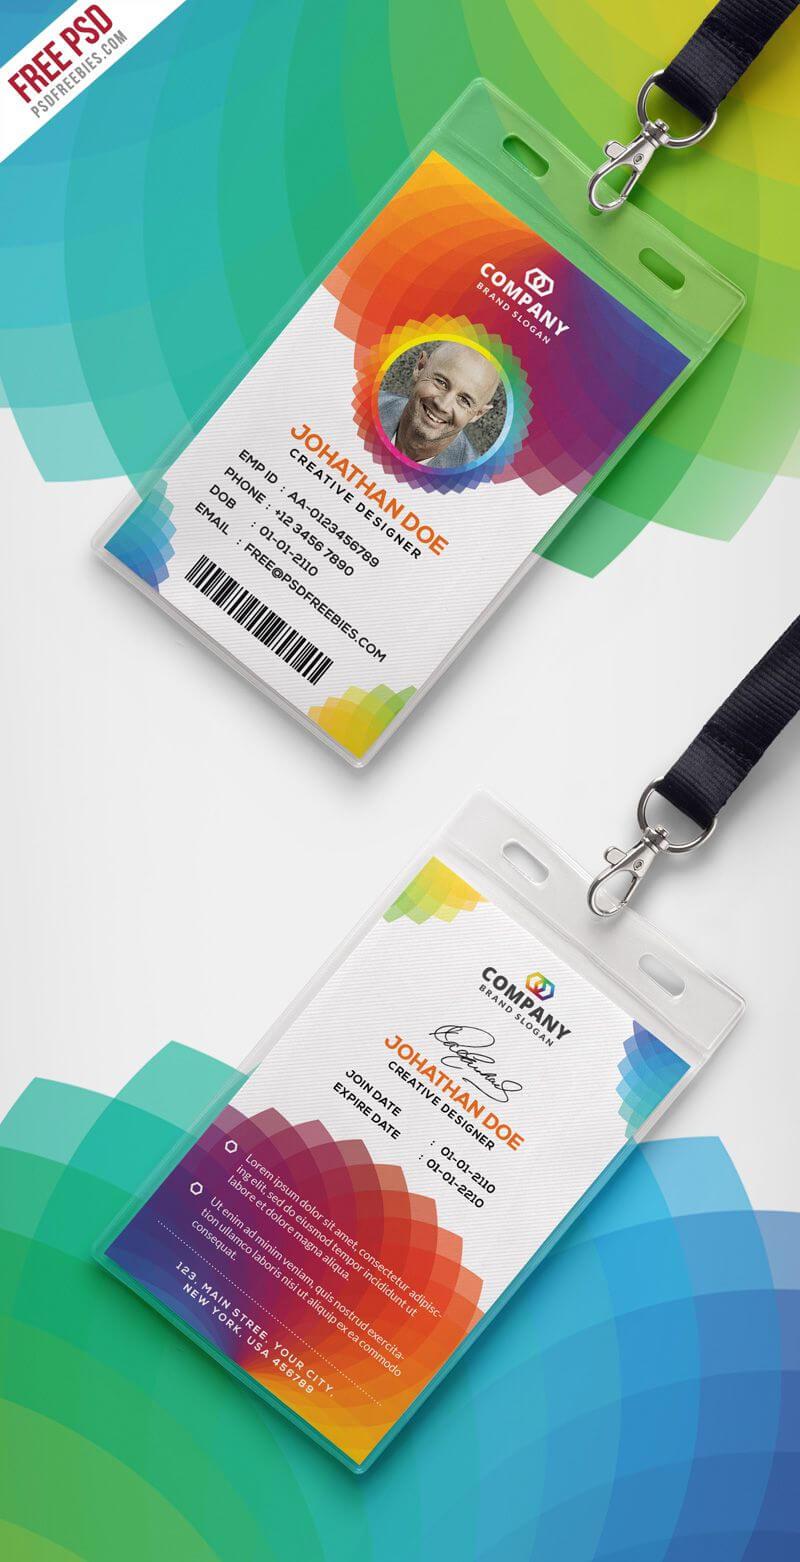 Corporate Branding Identity Card Free Psd | Id Card Template Pertaining To Media Id Card Templates